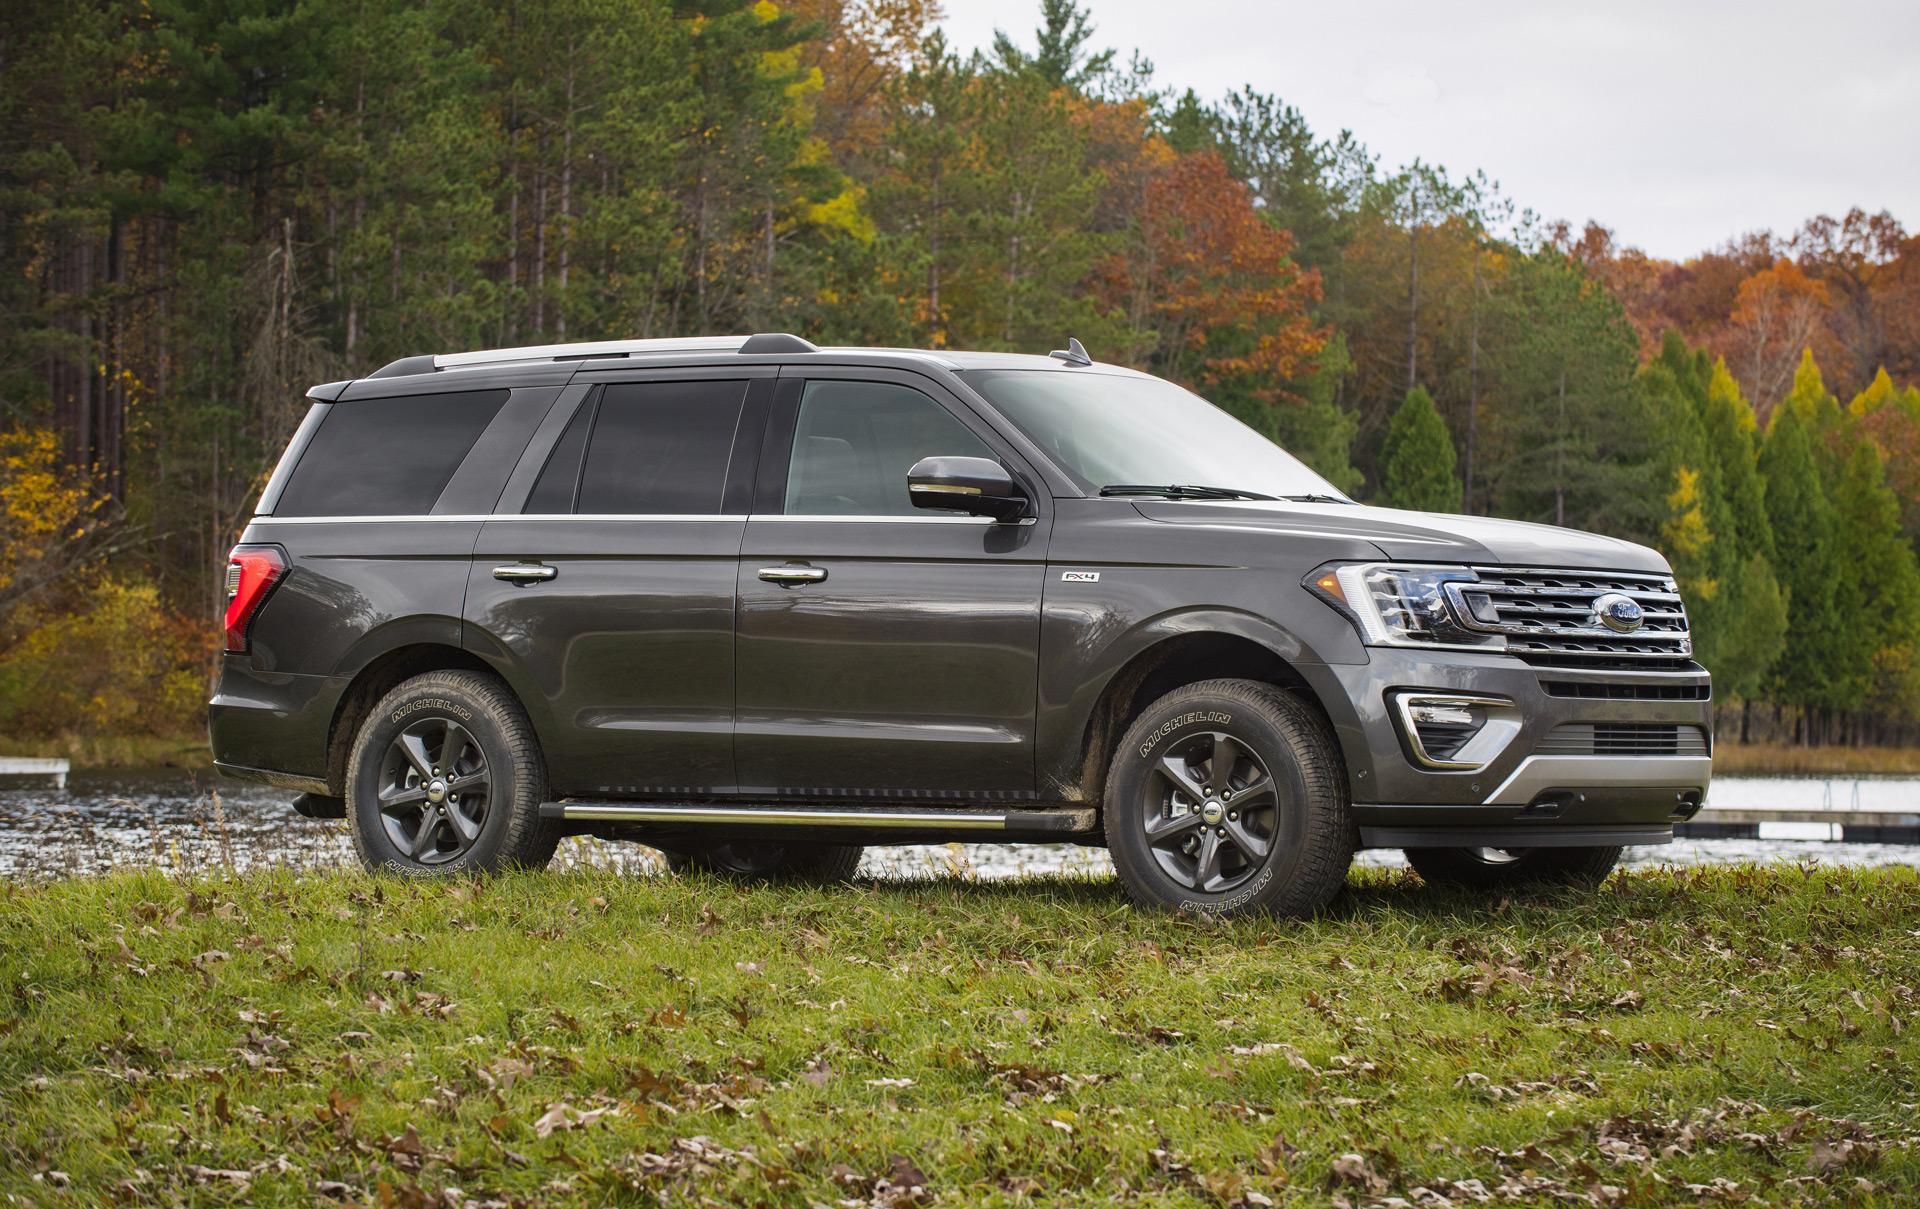 2020 Ford Expedition Vs 2020 Chevy Suburban Compare Suvs